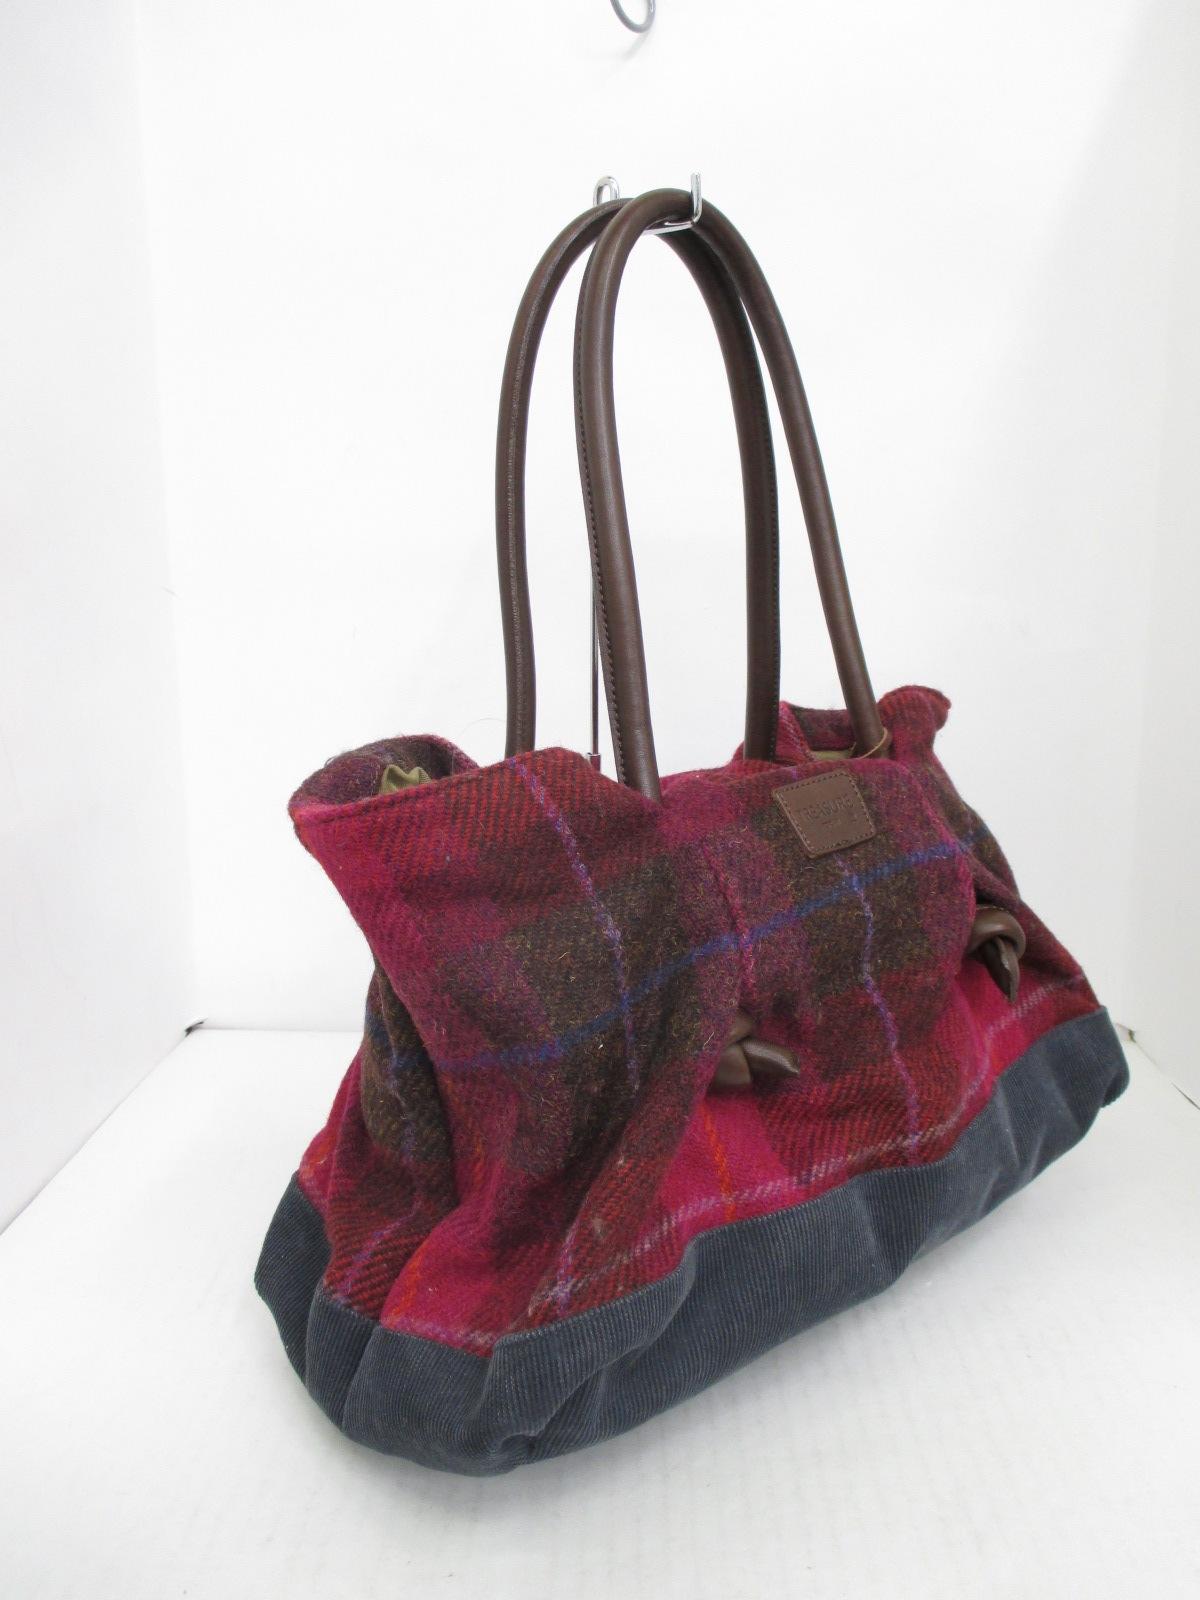 TREASURE TOPKAPI(トレジャートプカピ)のトートバッグ